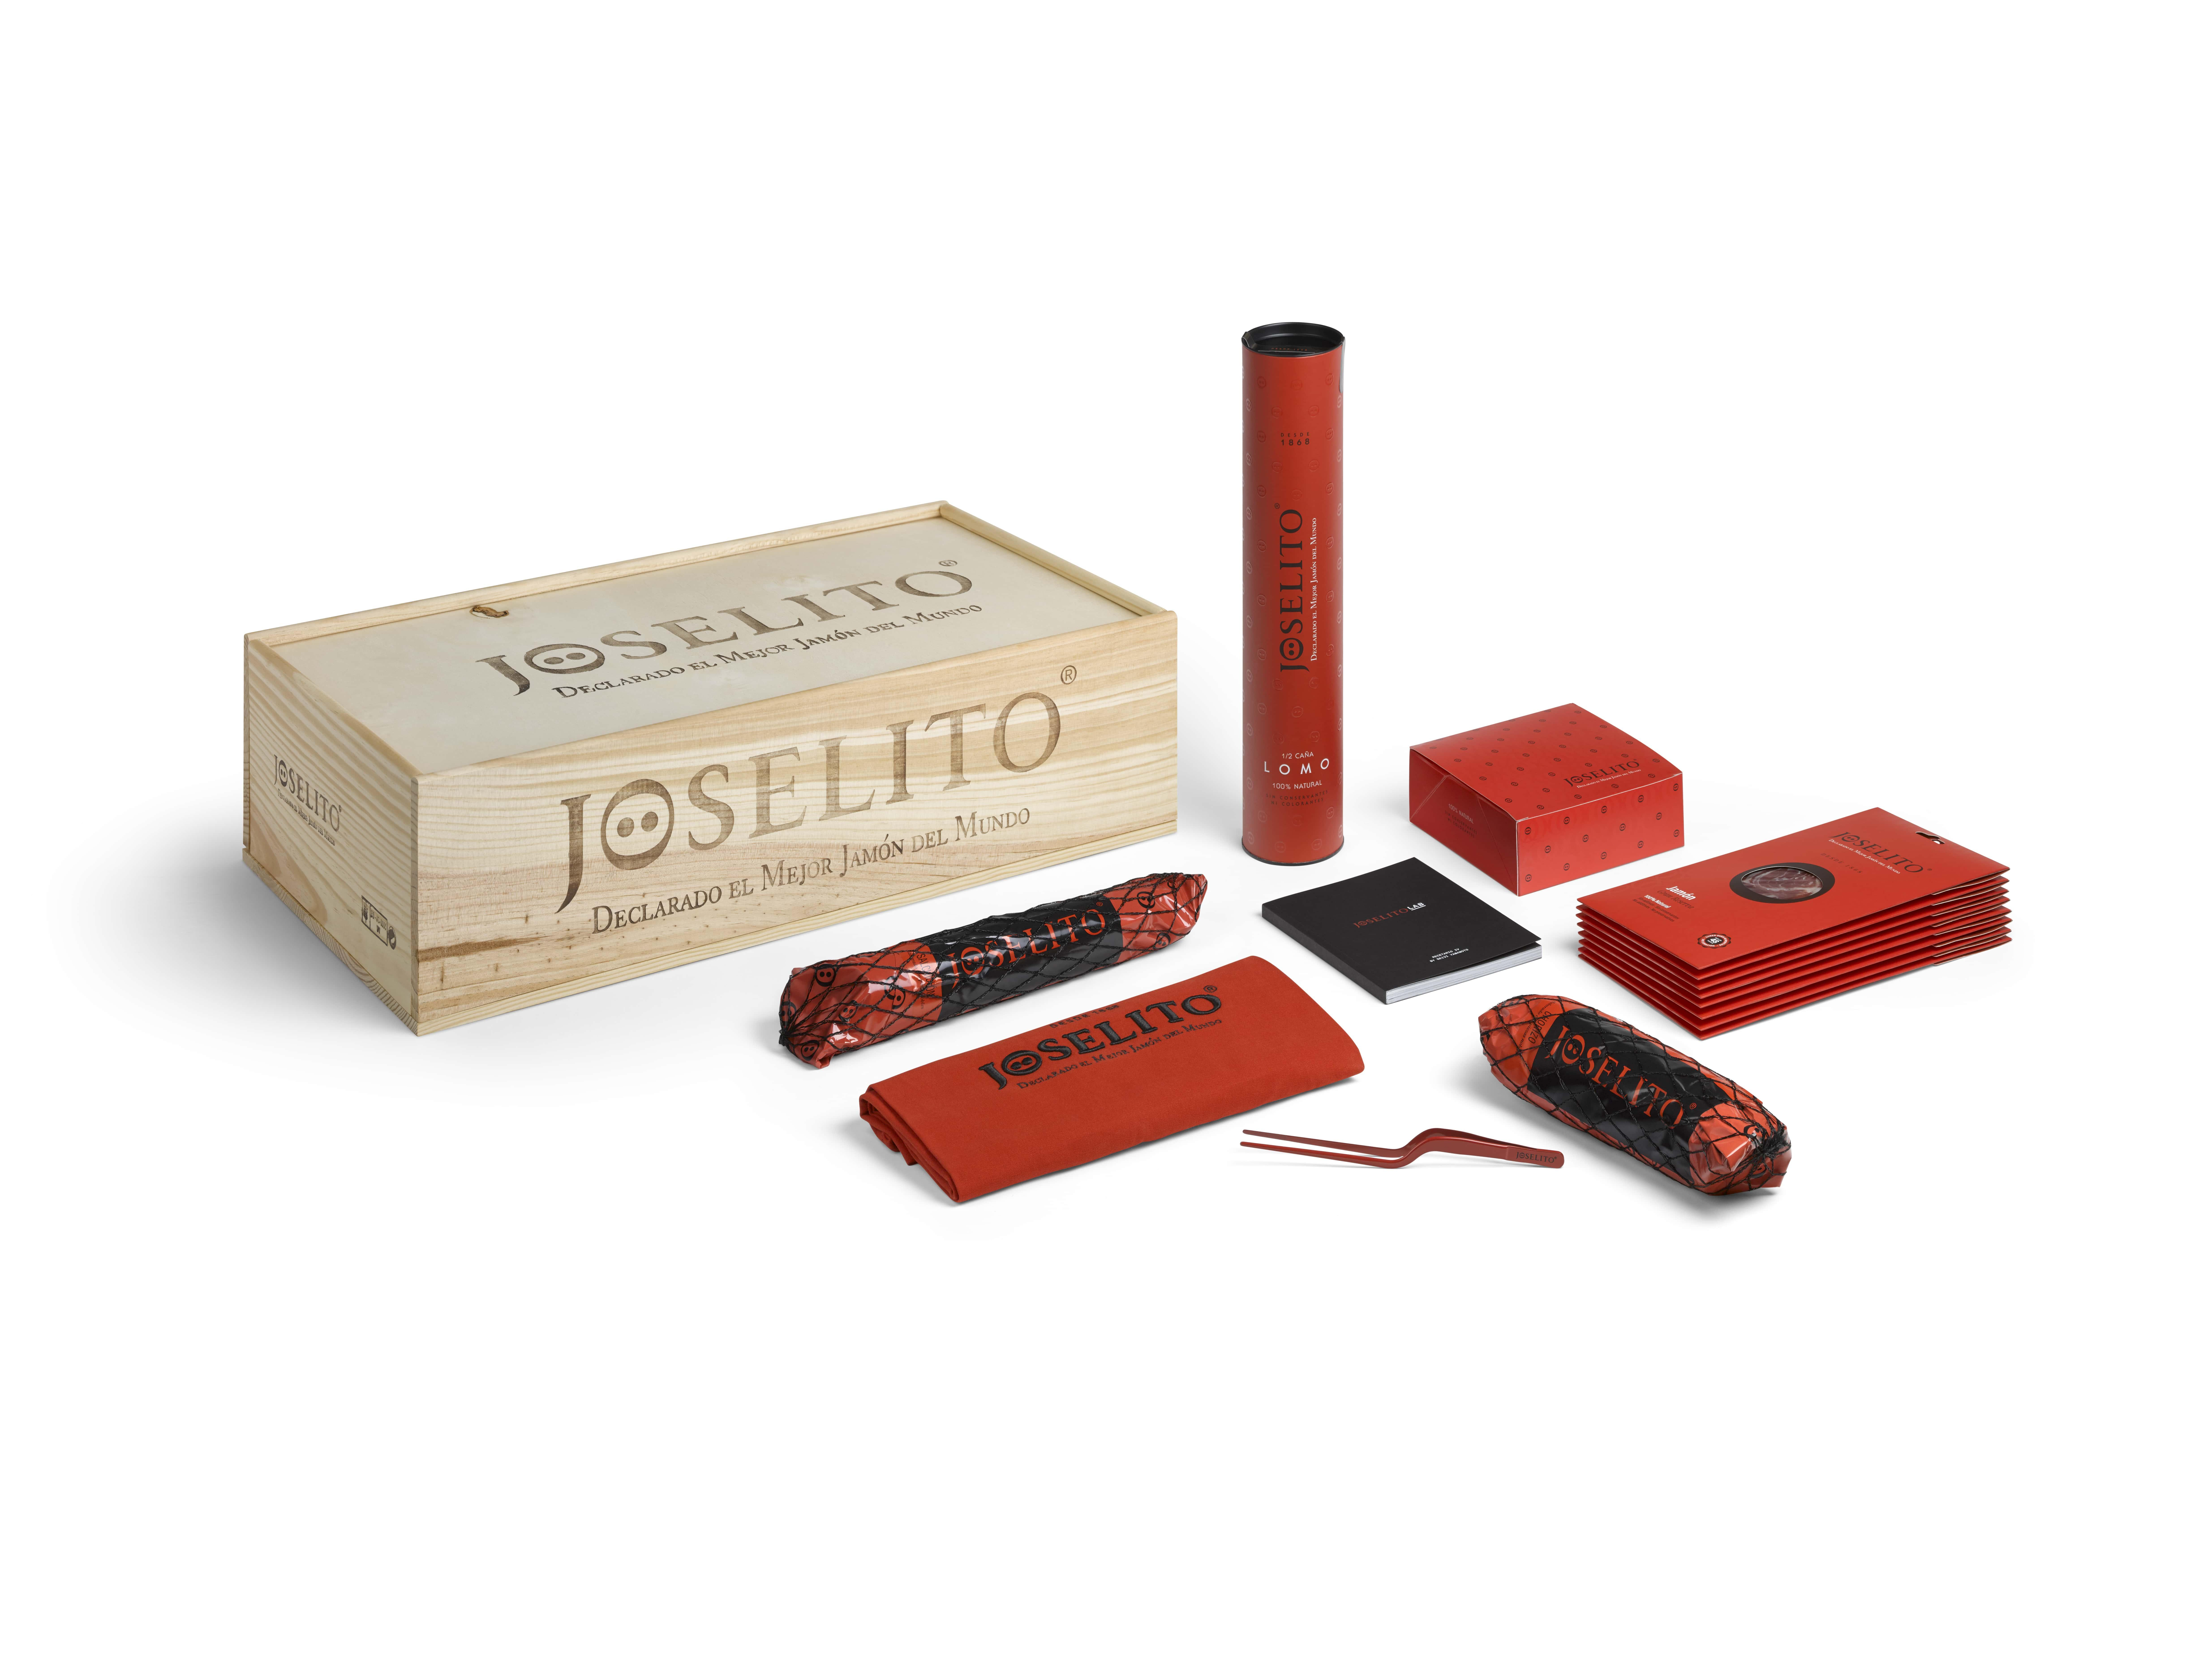 Caja Variada Joselito